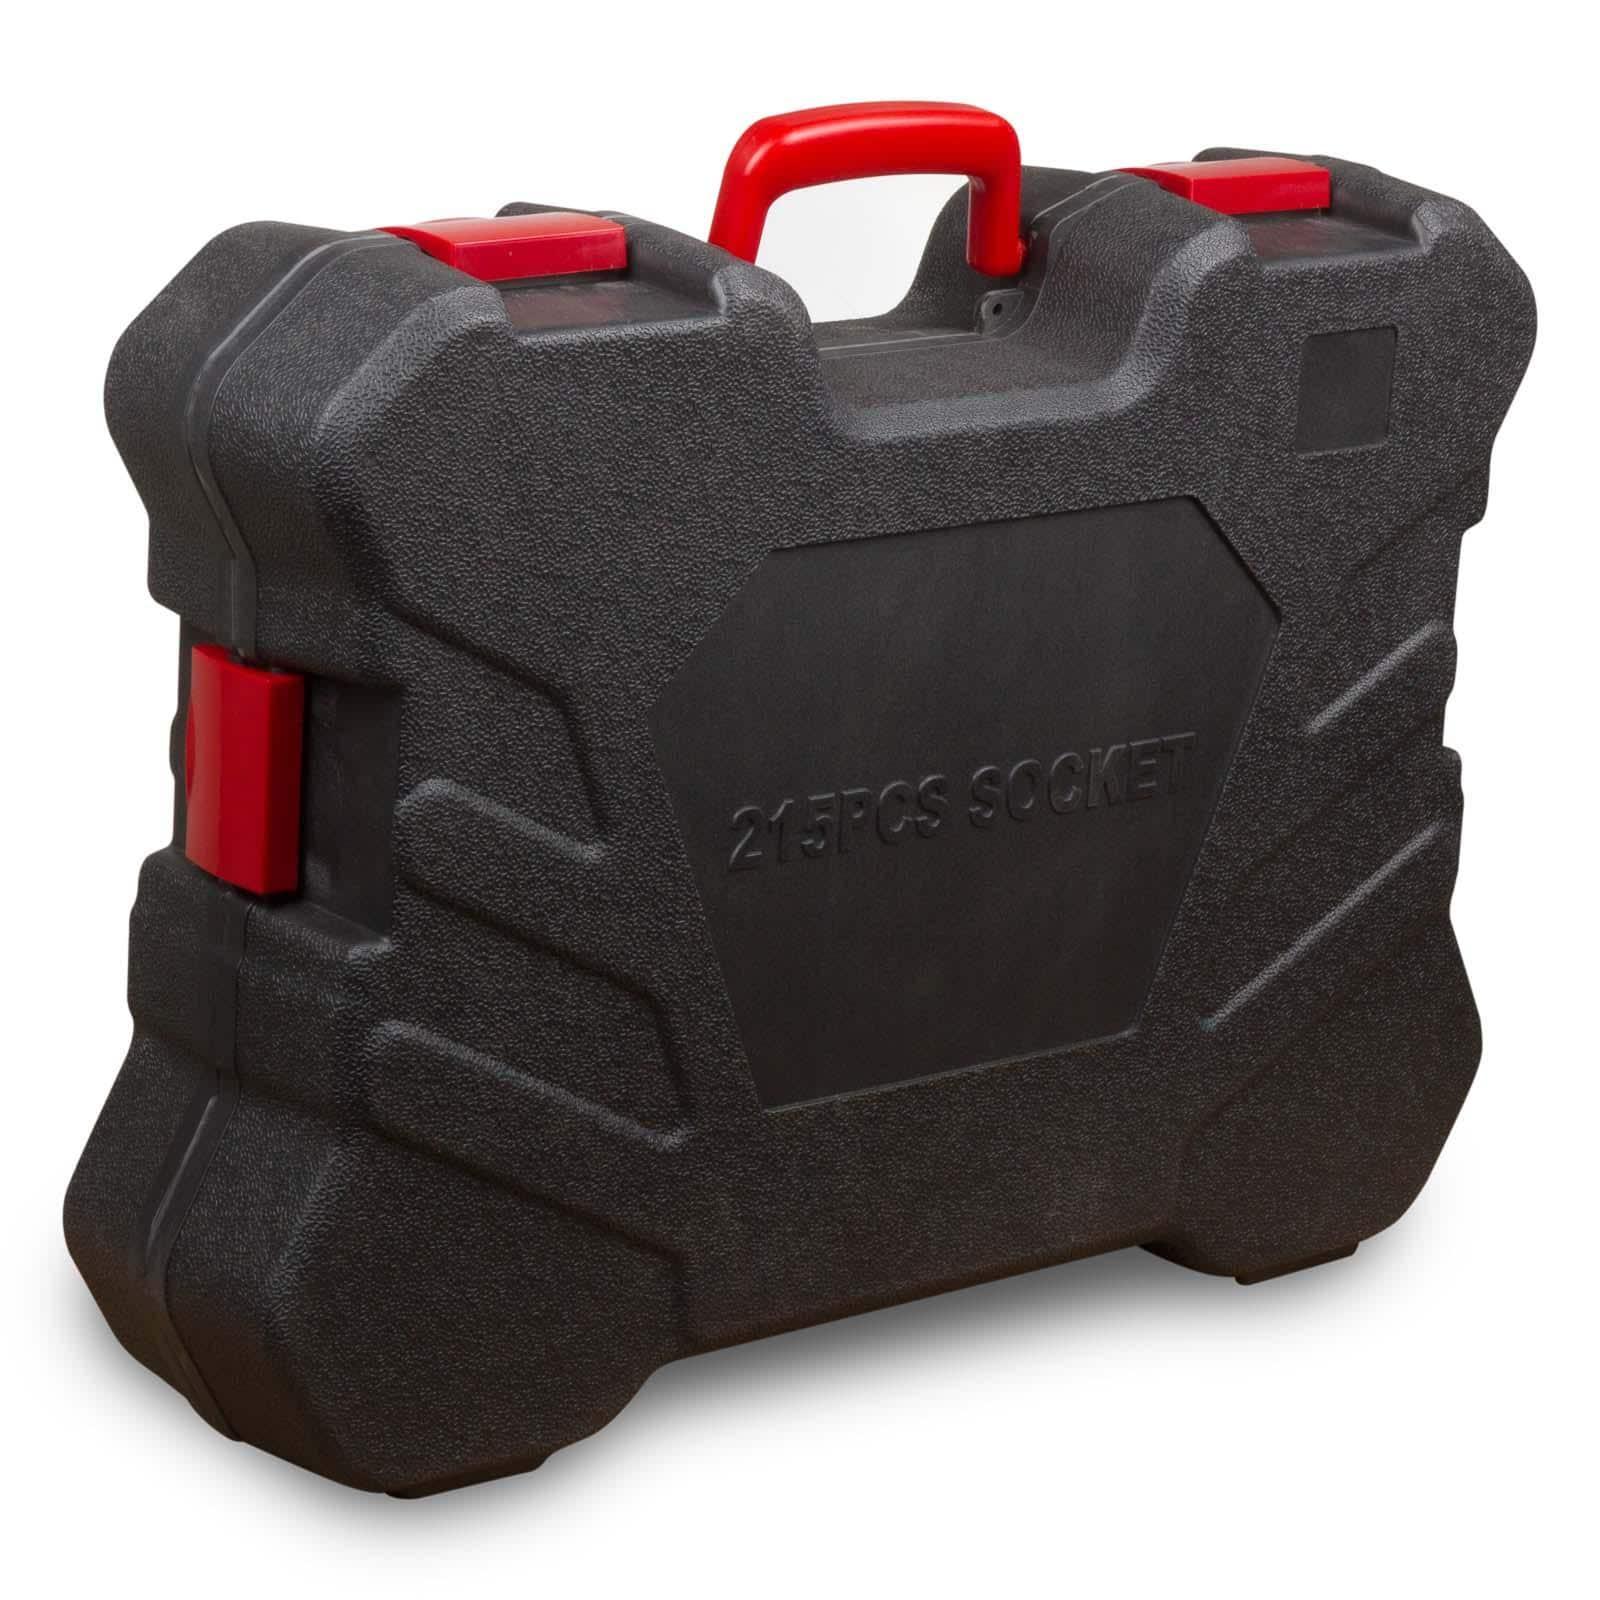 Hanse Werkzeuge® 215 delige doppenset/steeksleutelset/ratelset XL